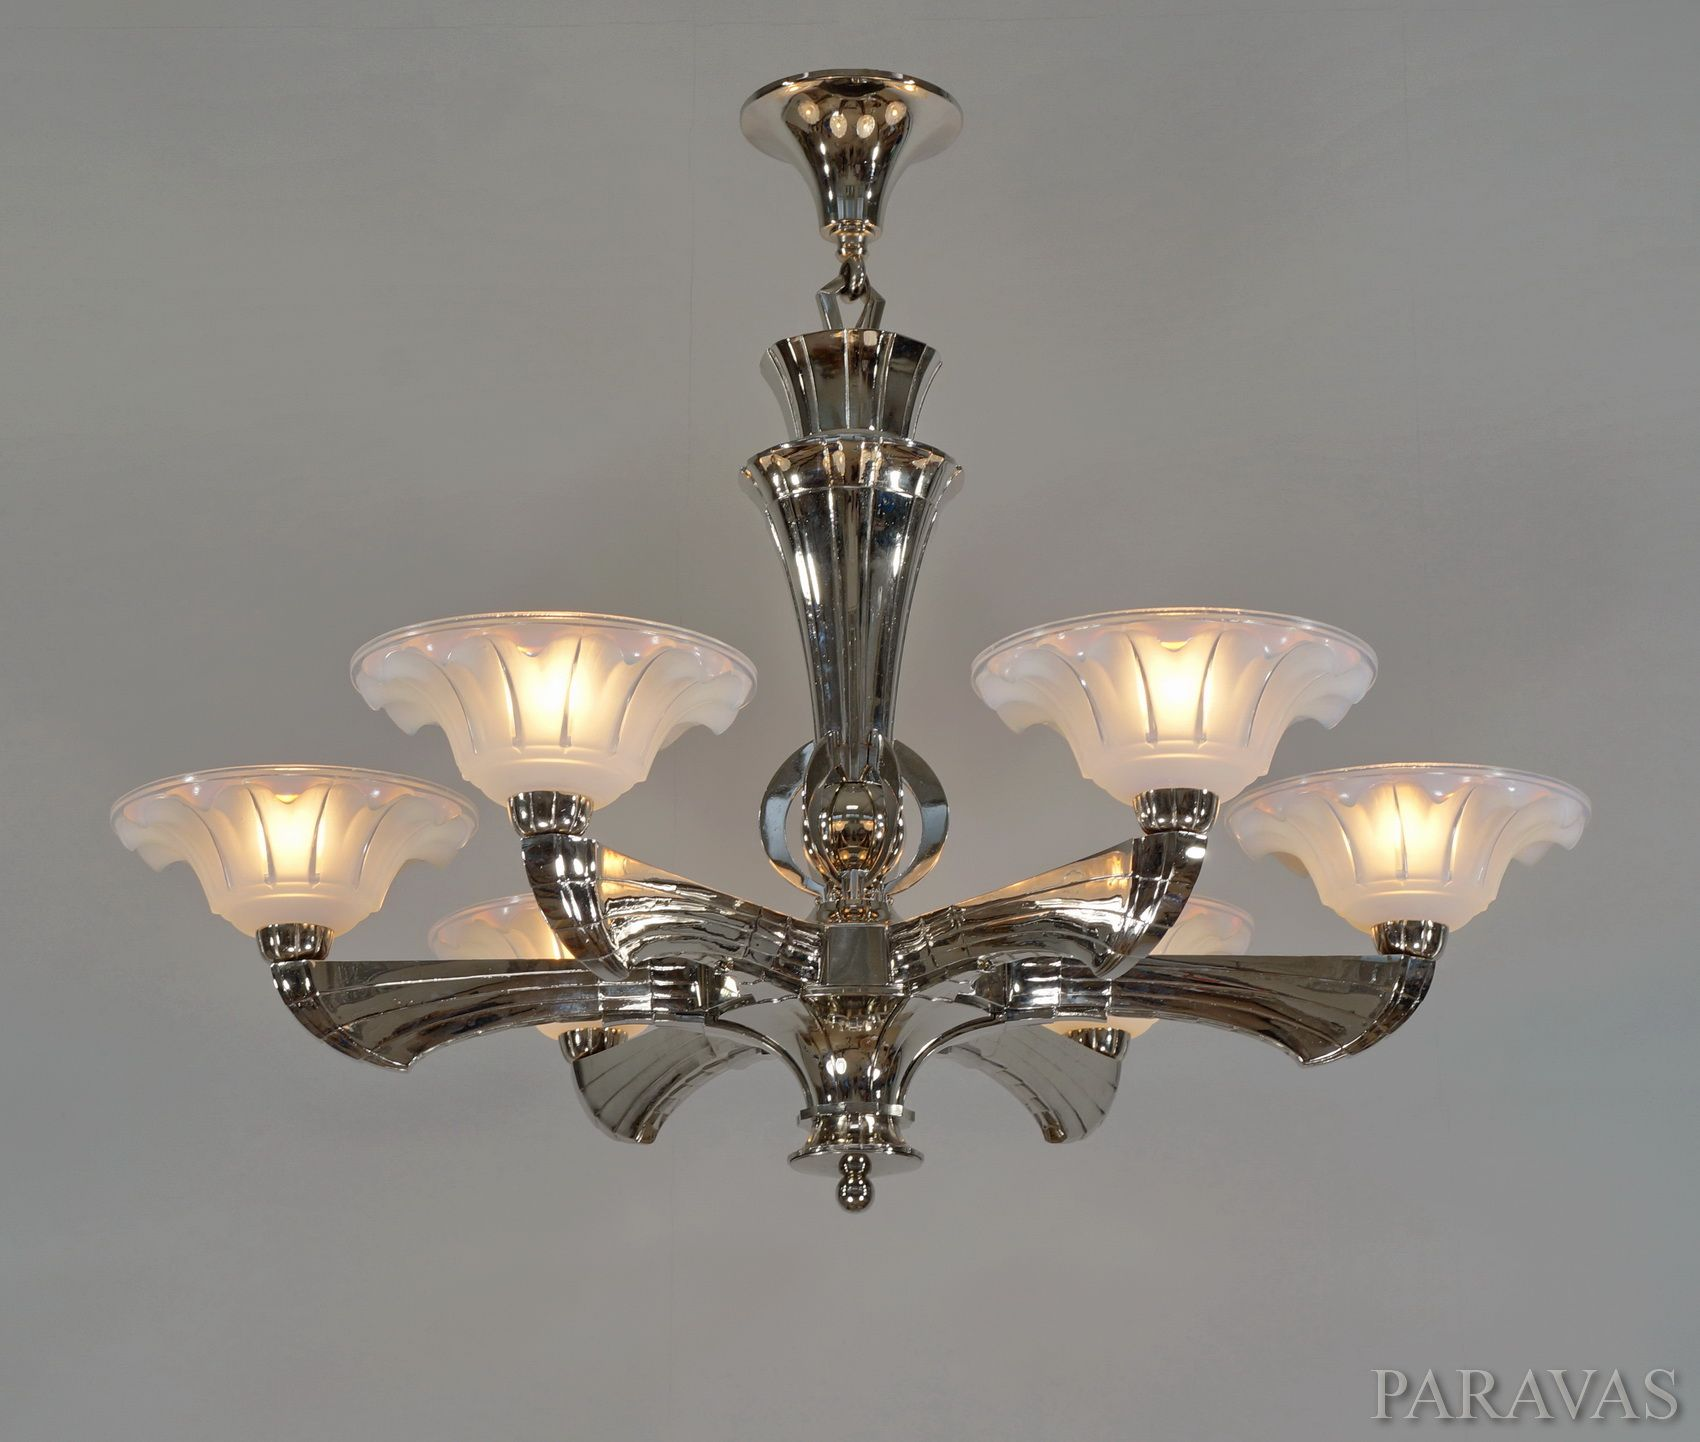 Ezan large french art deco chandelier around 1935 holding six ezan large french art deco chandelier around 1935 holding six opalescent ezan cups arubaitofo Choice Image